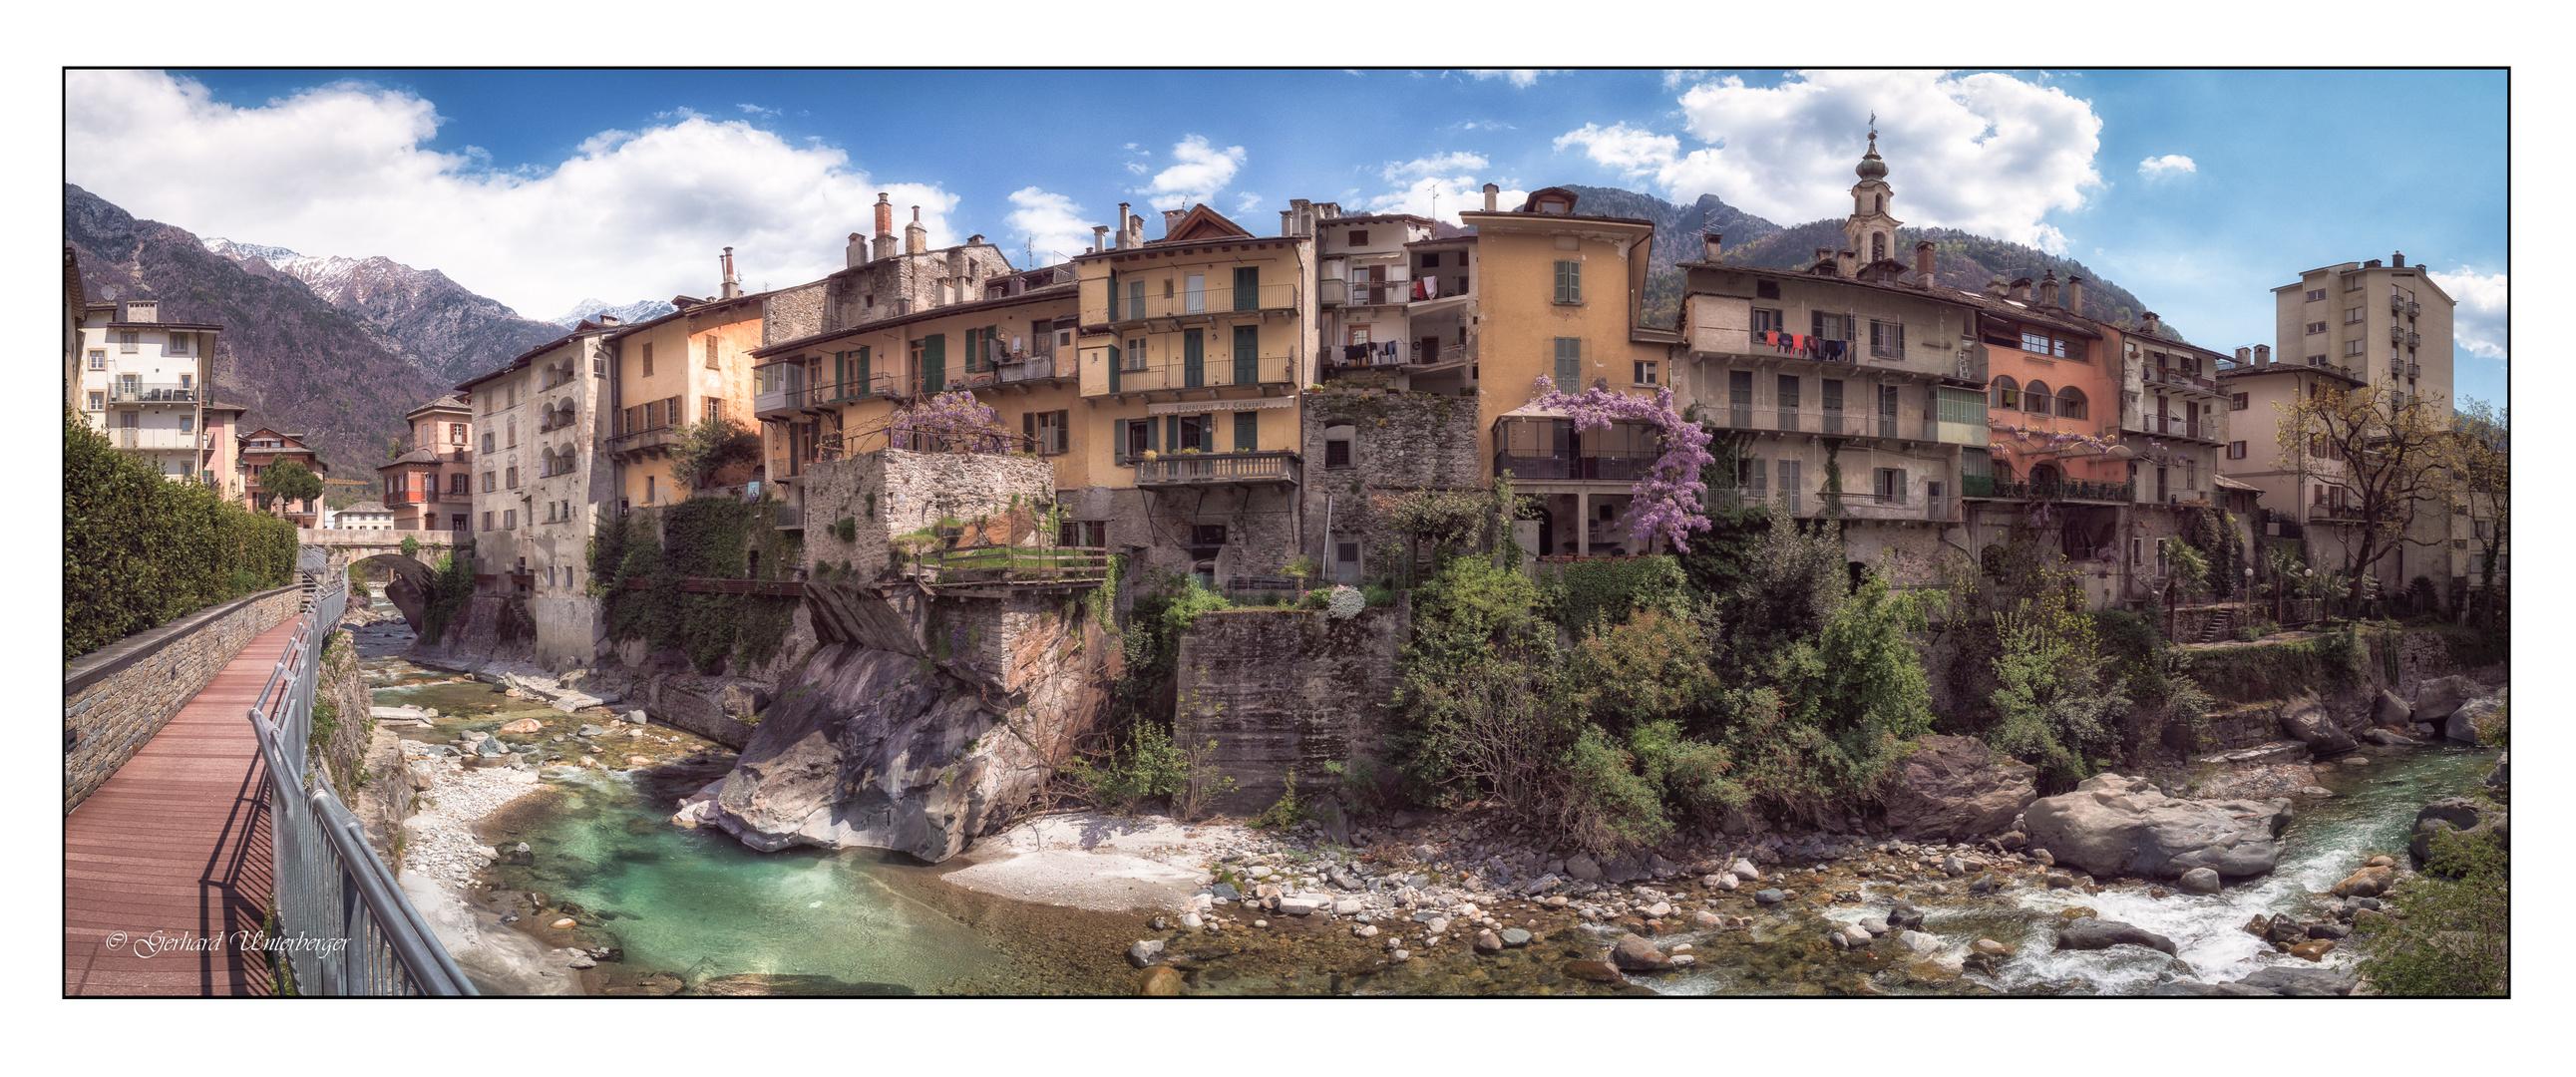 Chiavenna (Lombardei)